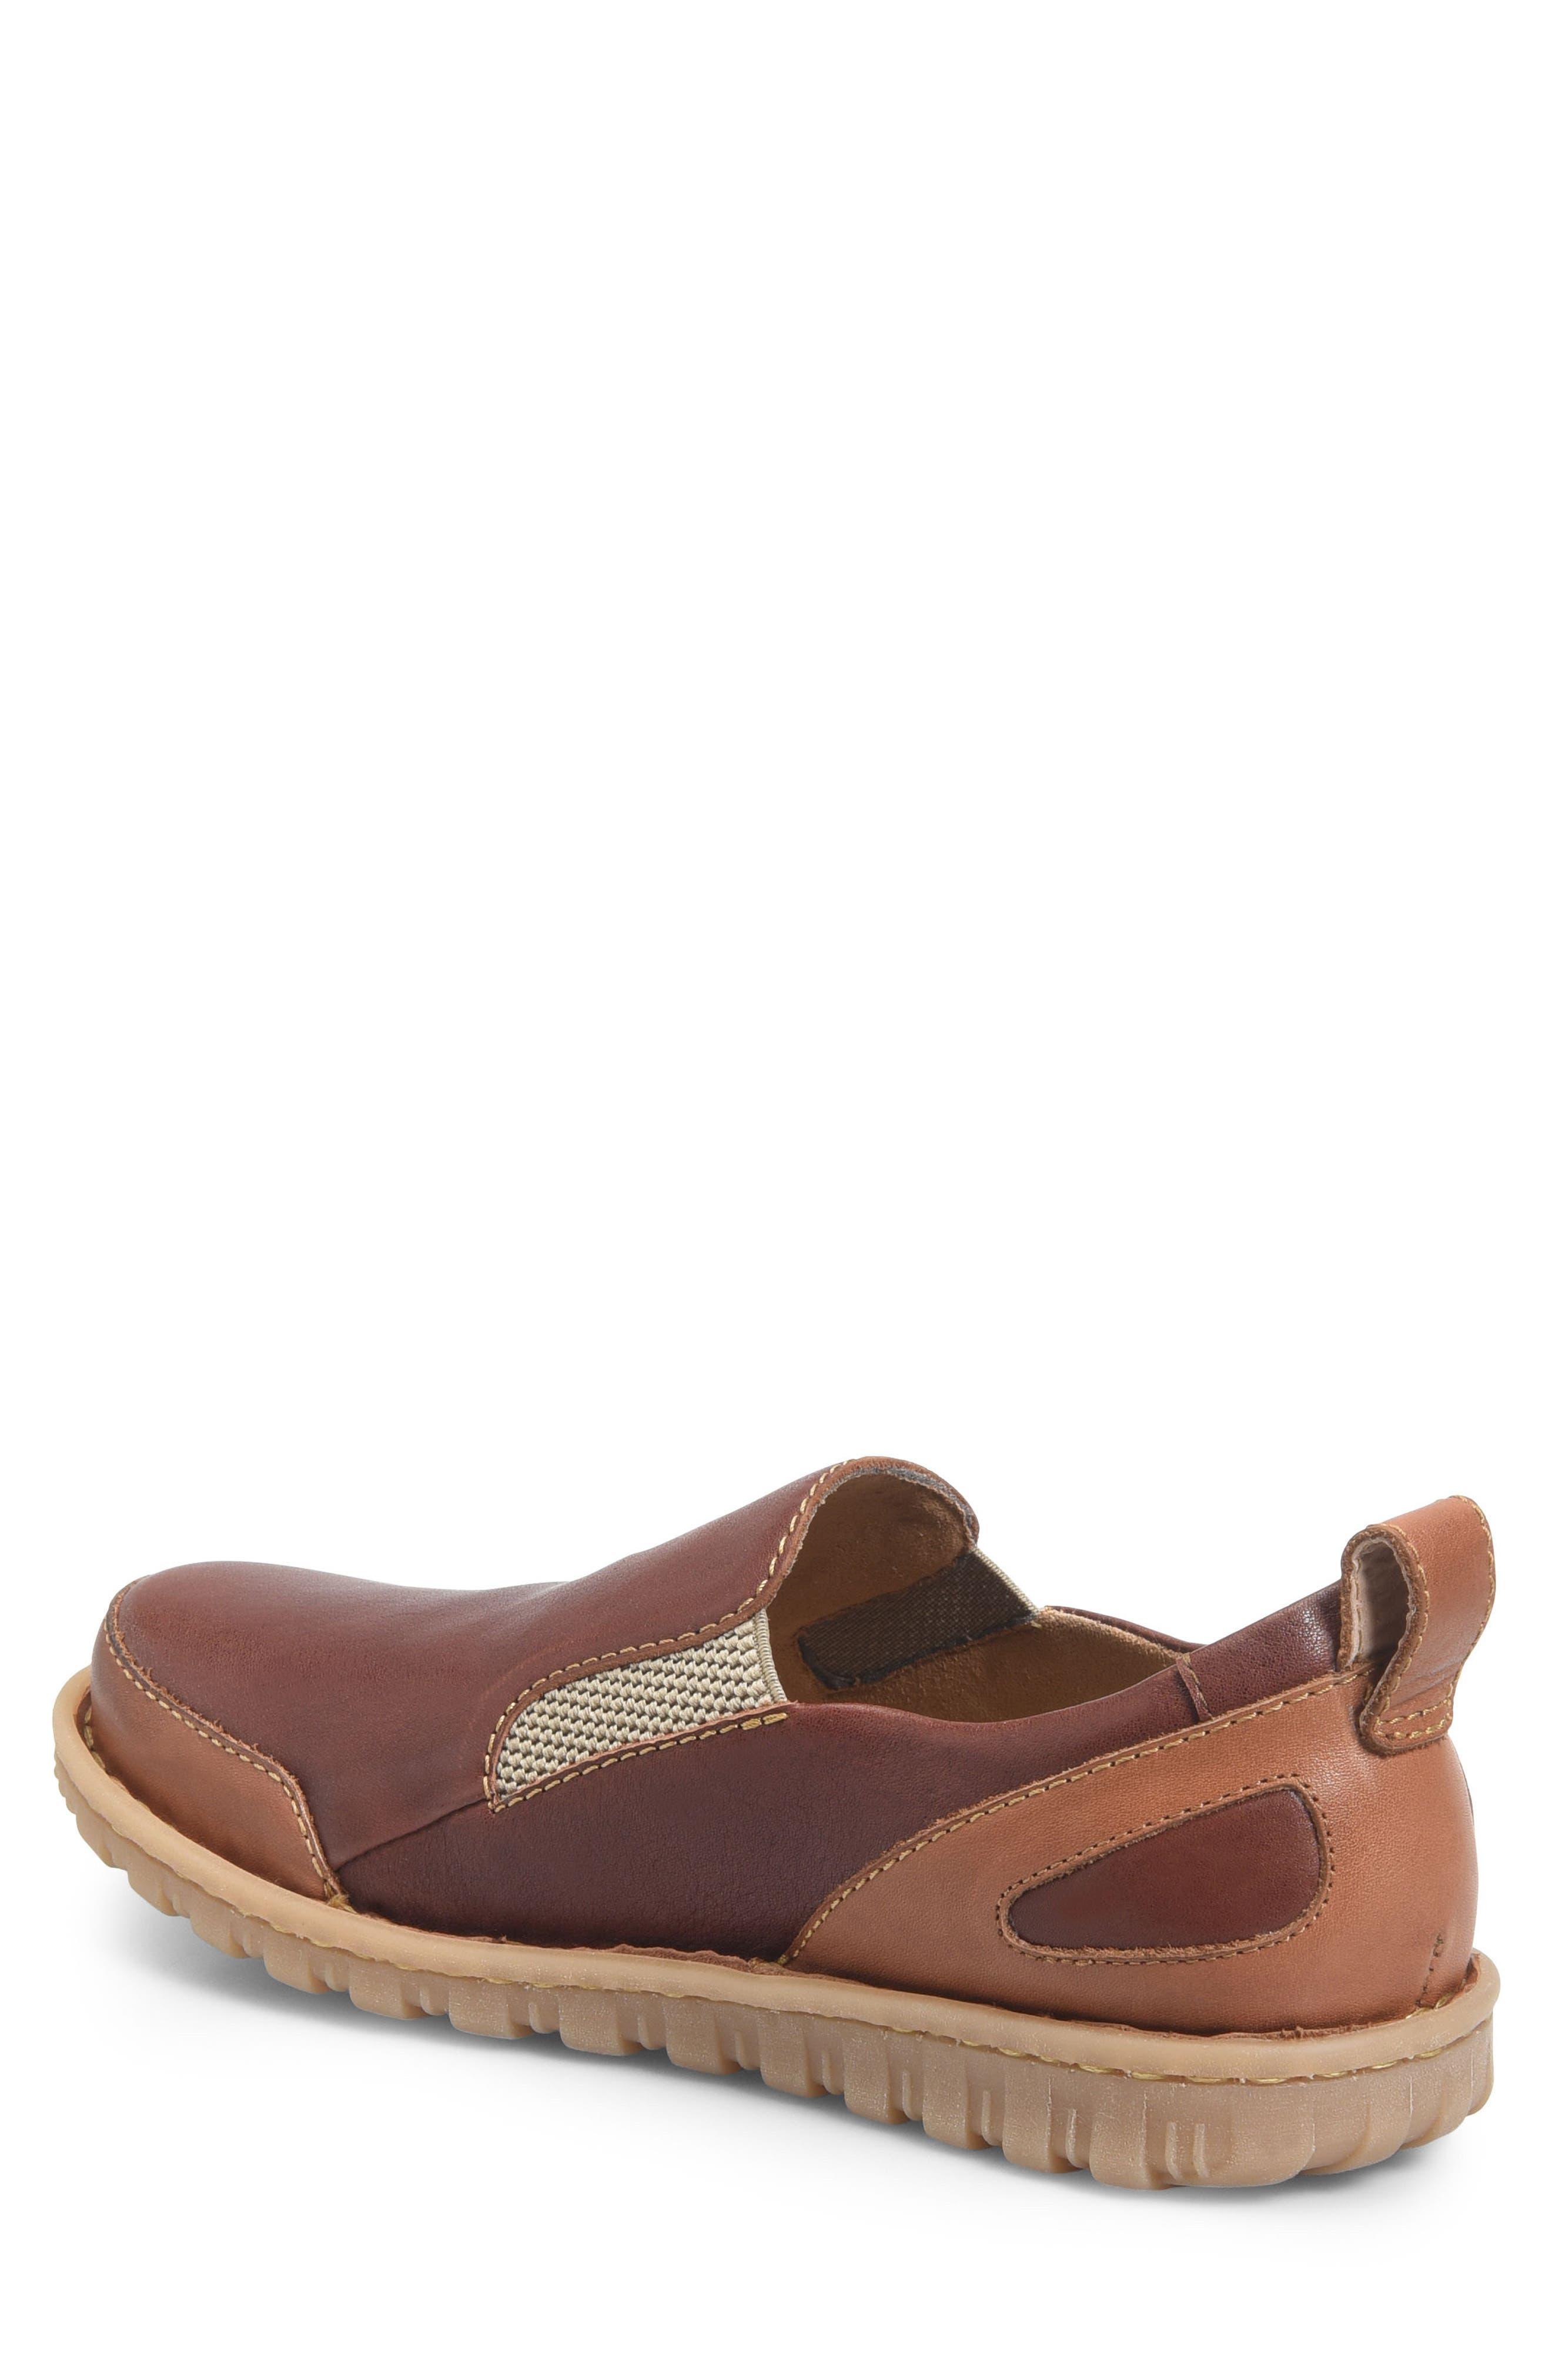 Pepper Slip-On,                             Alternate thumbnail 4, color,                             Brown/ Rust Leather